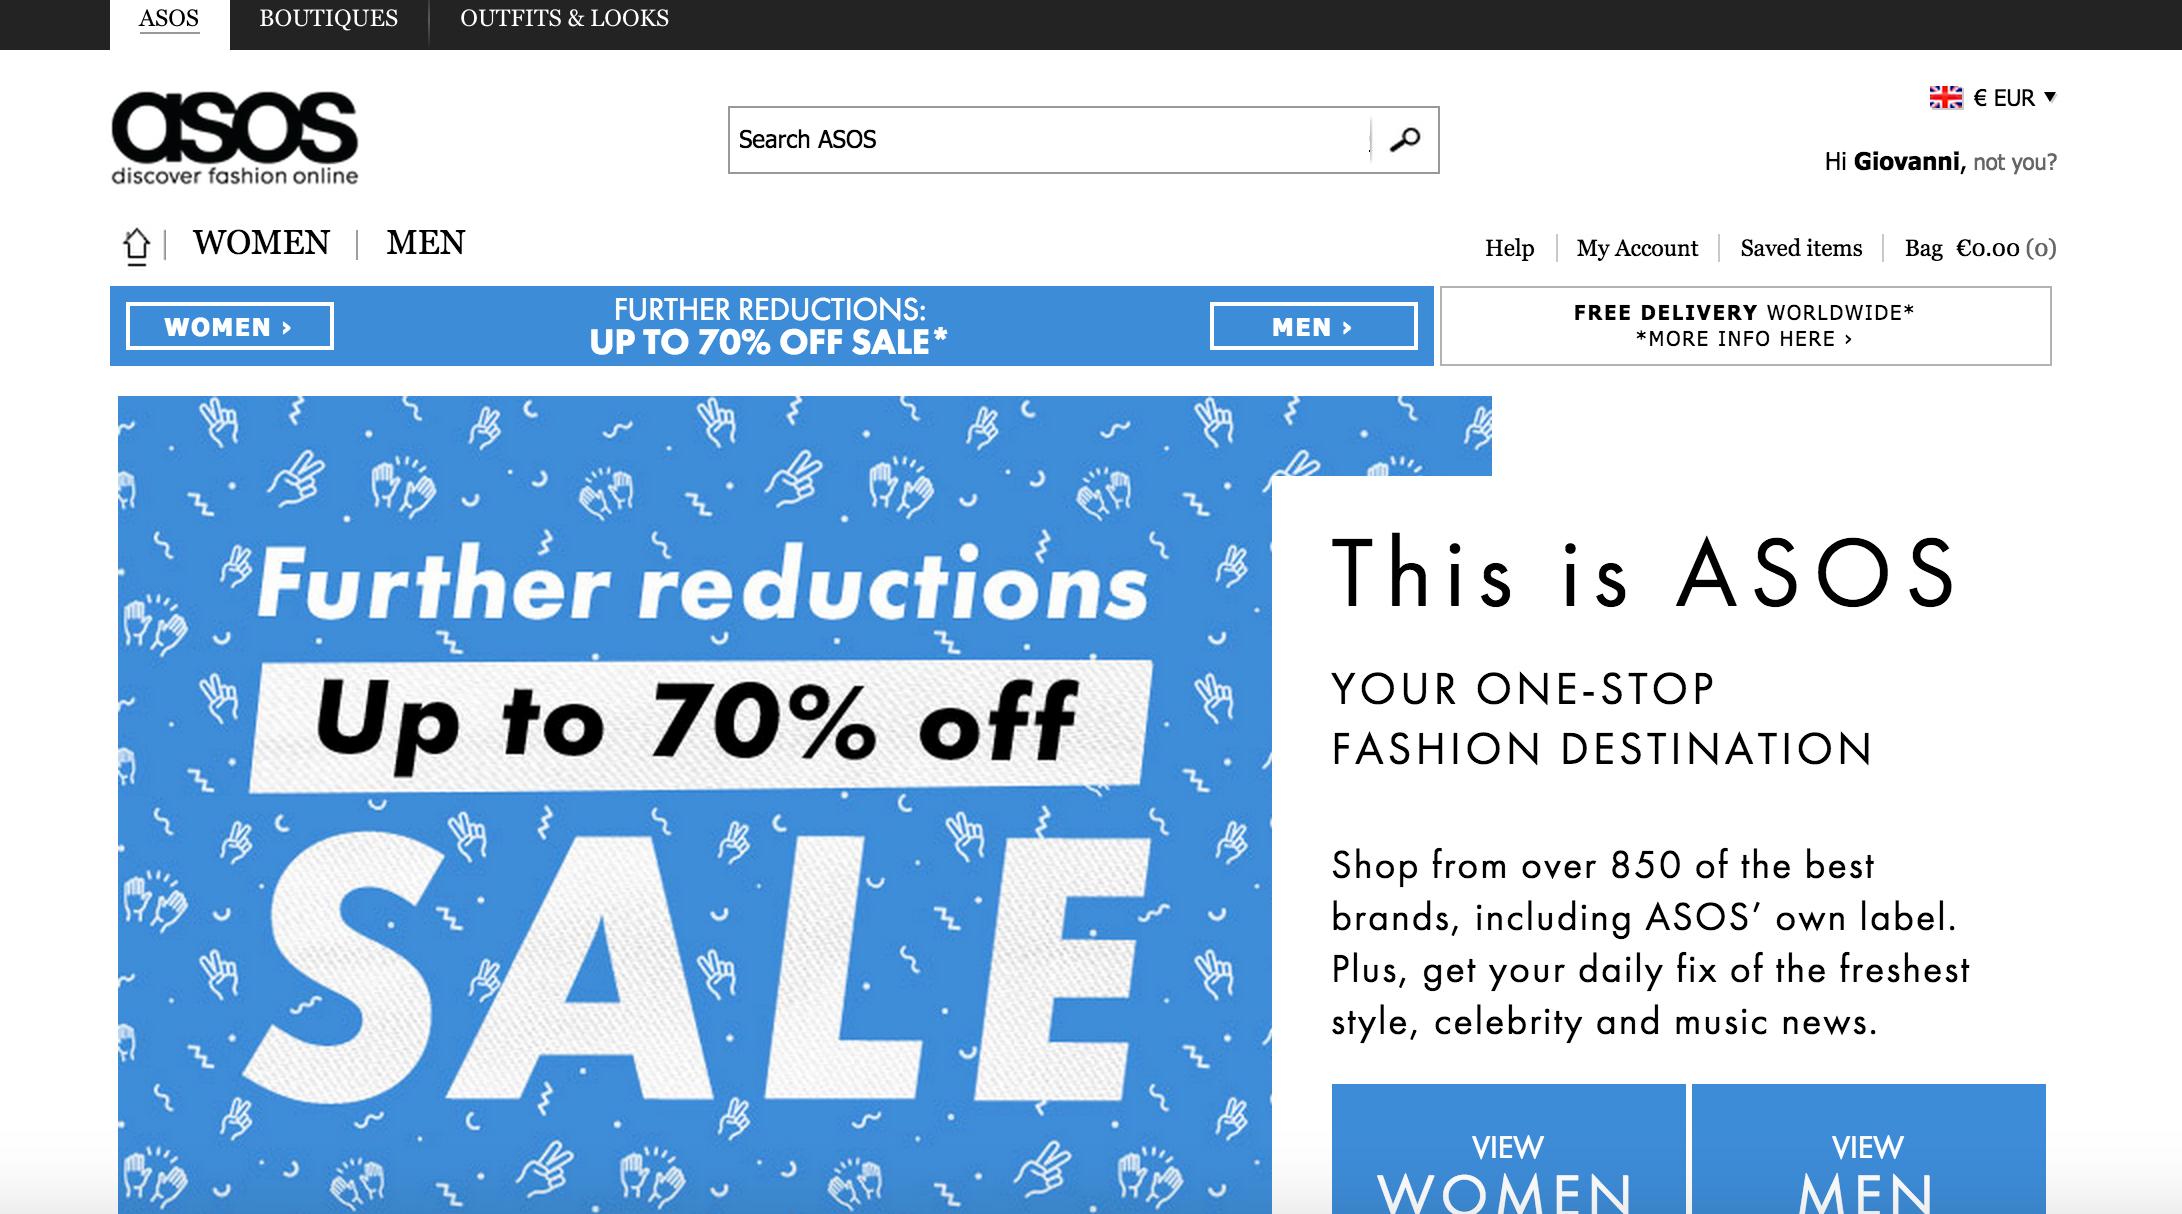 Asos UK Market Leader servizio E-commerce